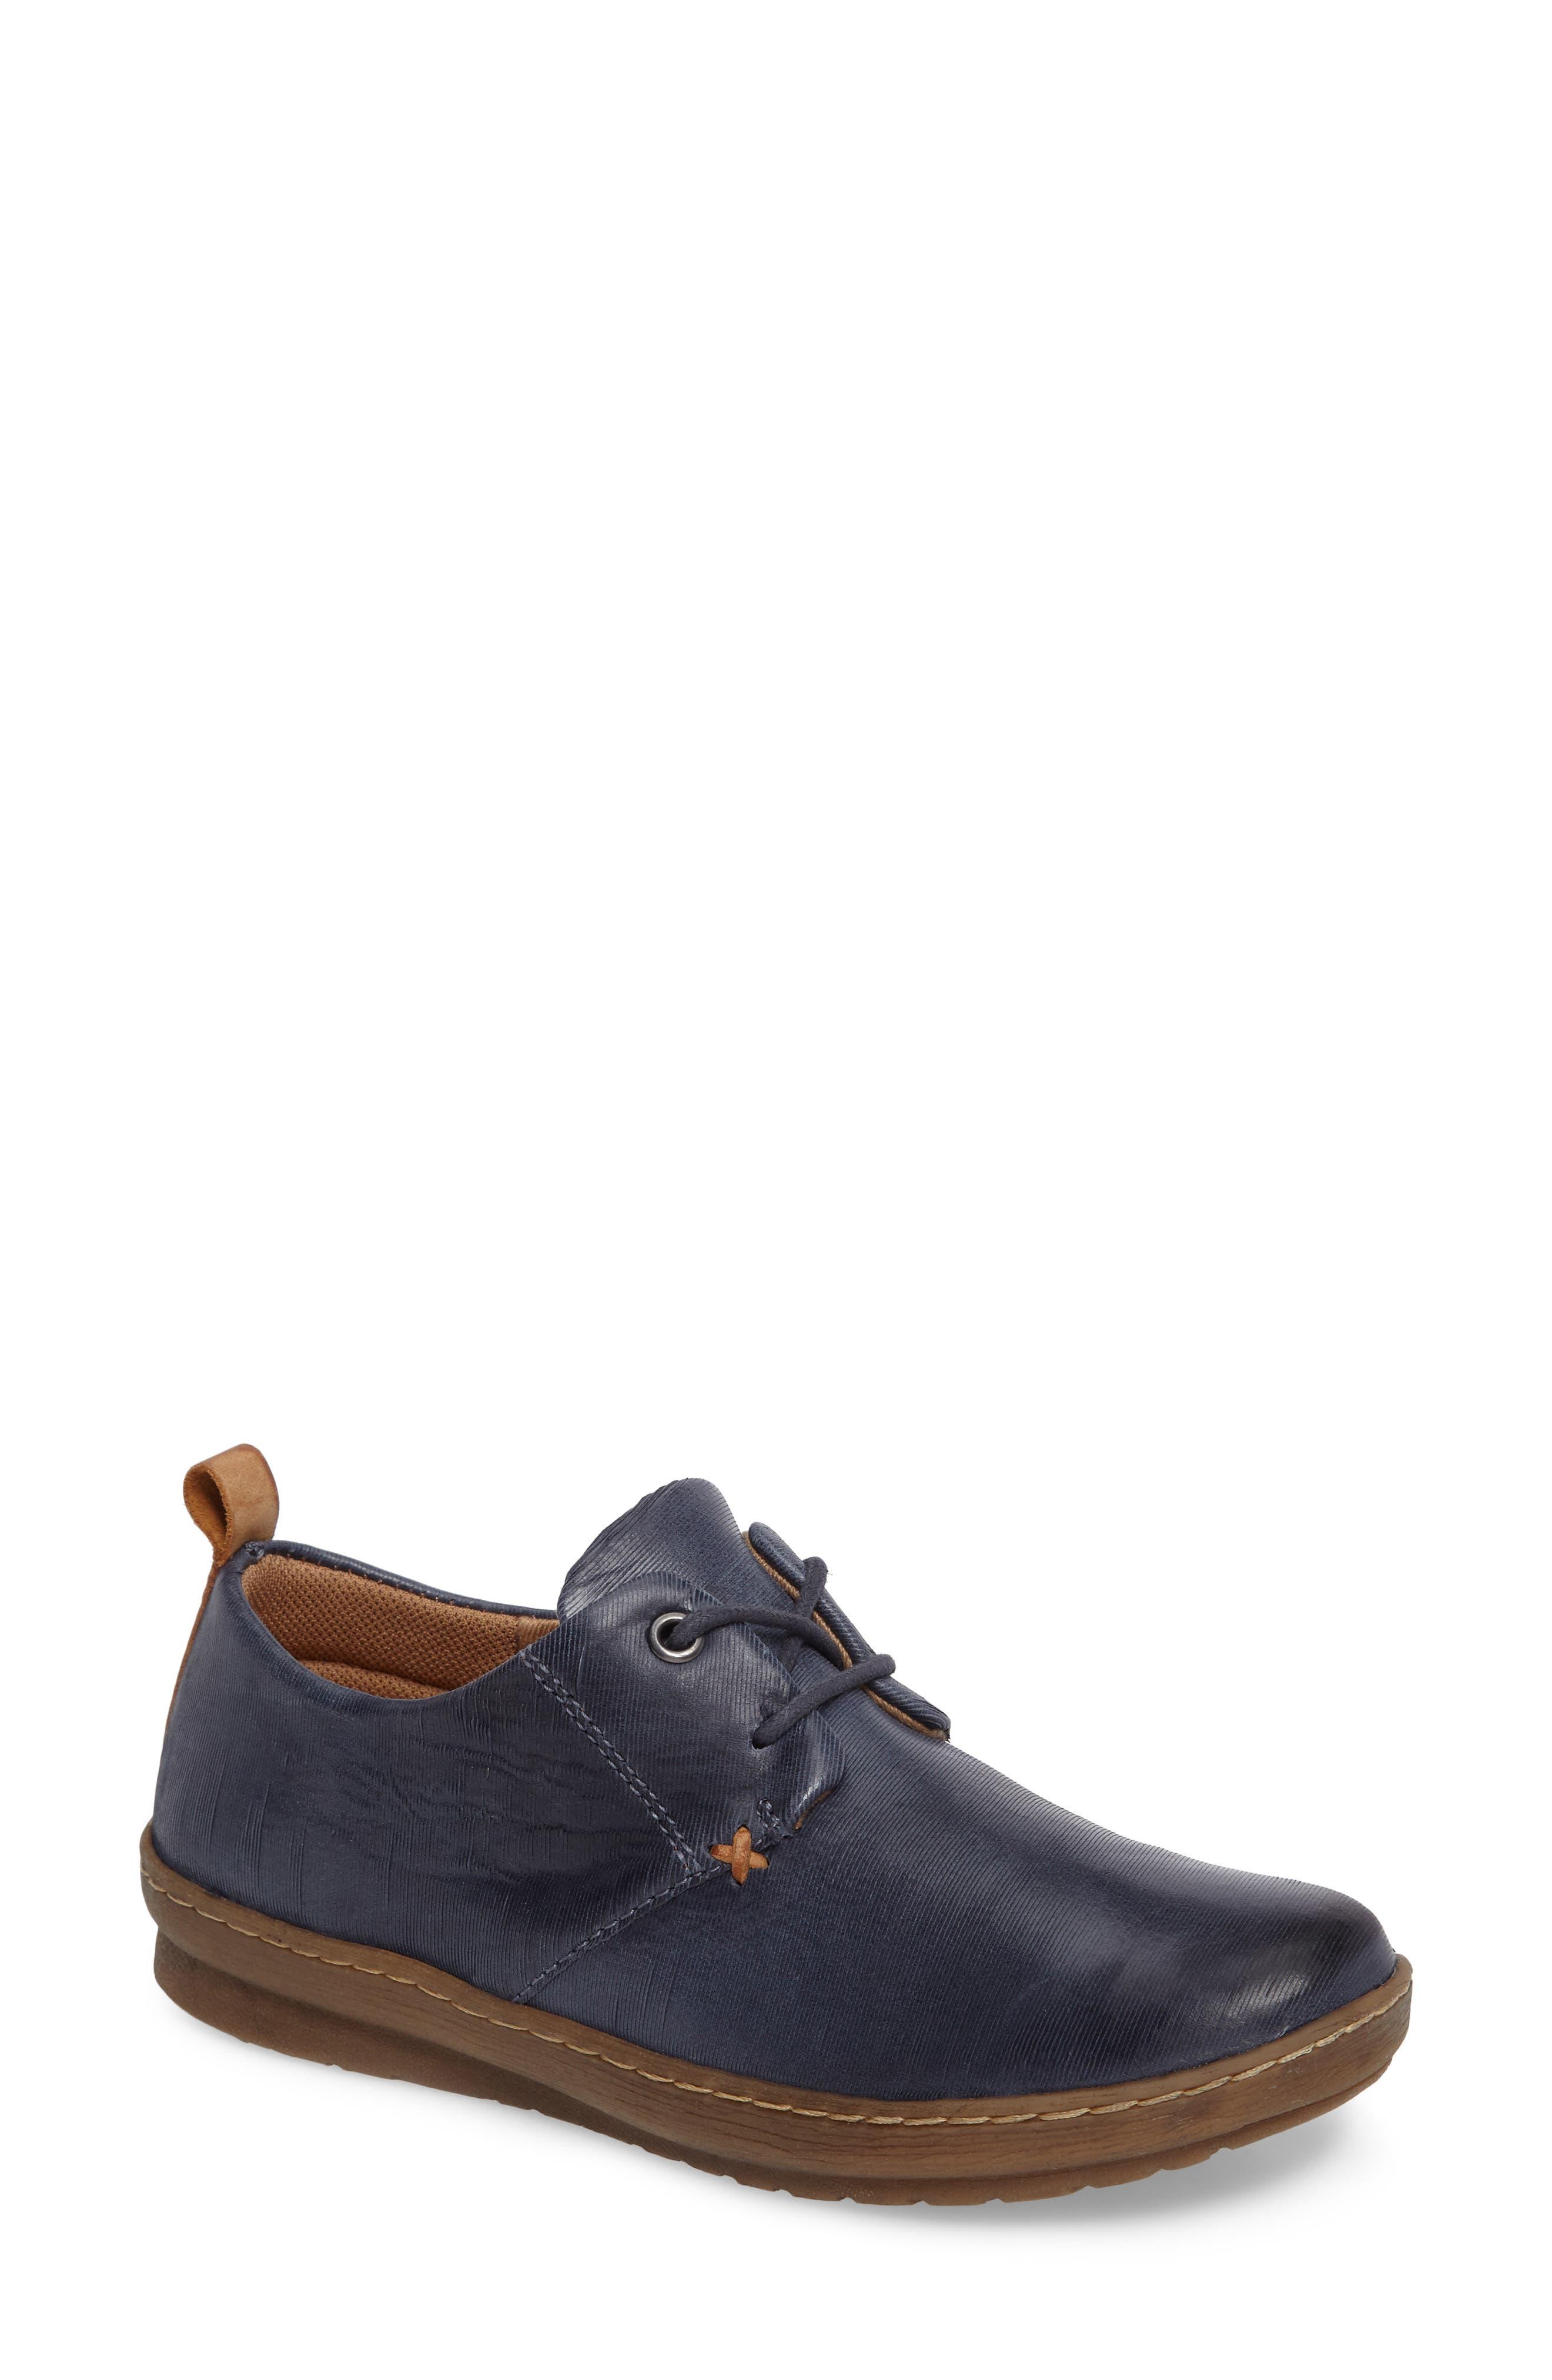 Cassandra Siped Sneaker,                             Main thumbnail 1, color,                             Denim Blue Leather